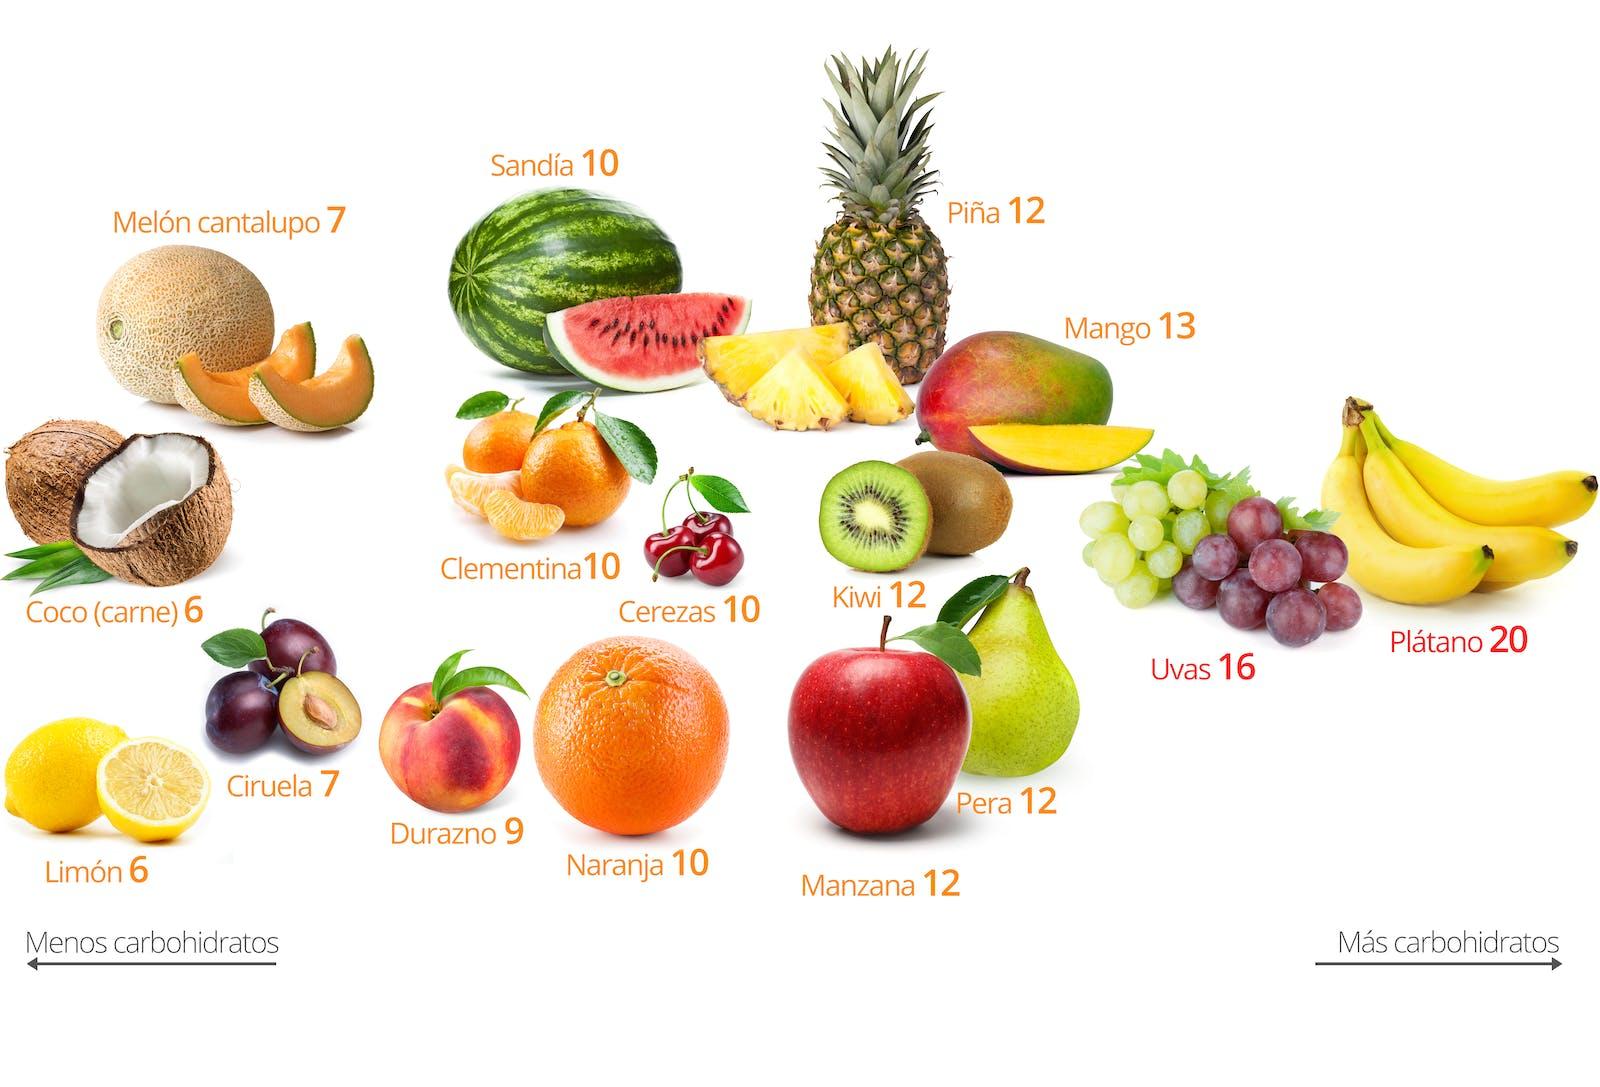 dieta de jugo pérdida de peso historias de éxito